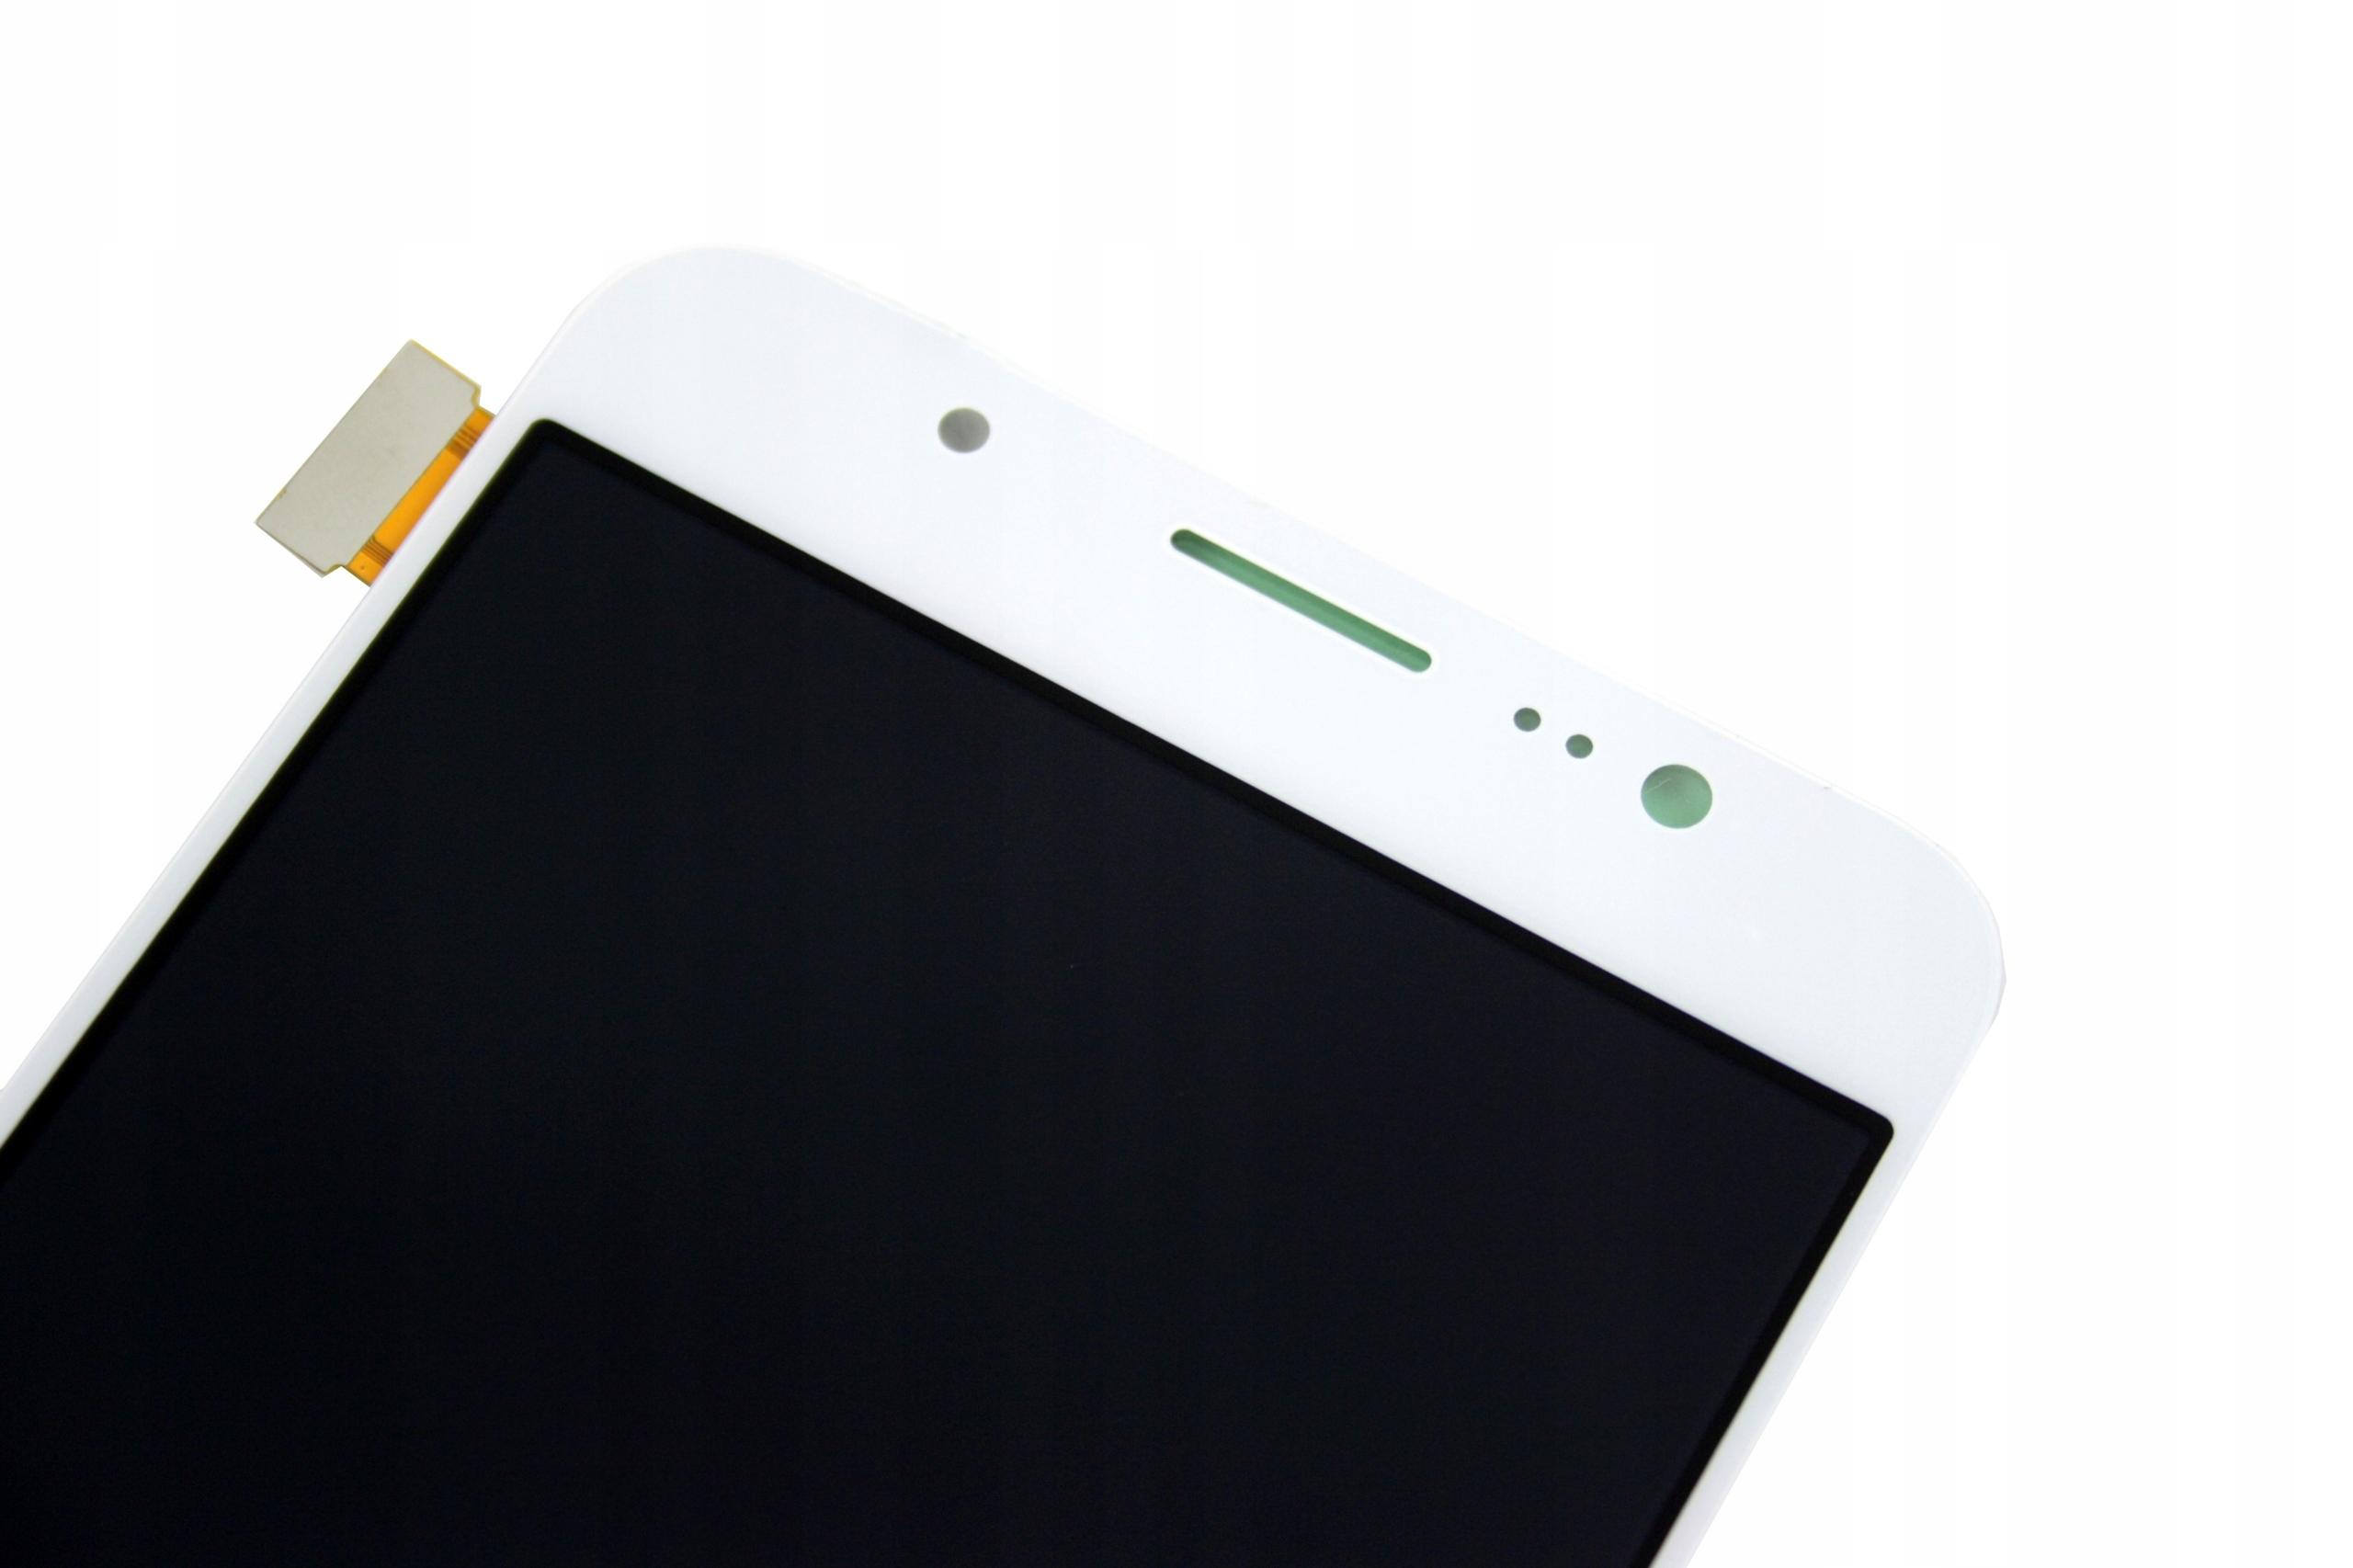 SAMSUNG LCD GALAXY J7 2016 J710 BIAŁY SM-J710FN